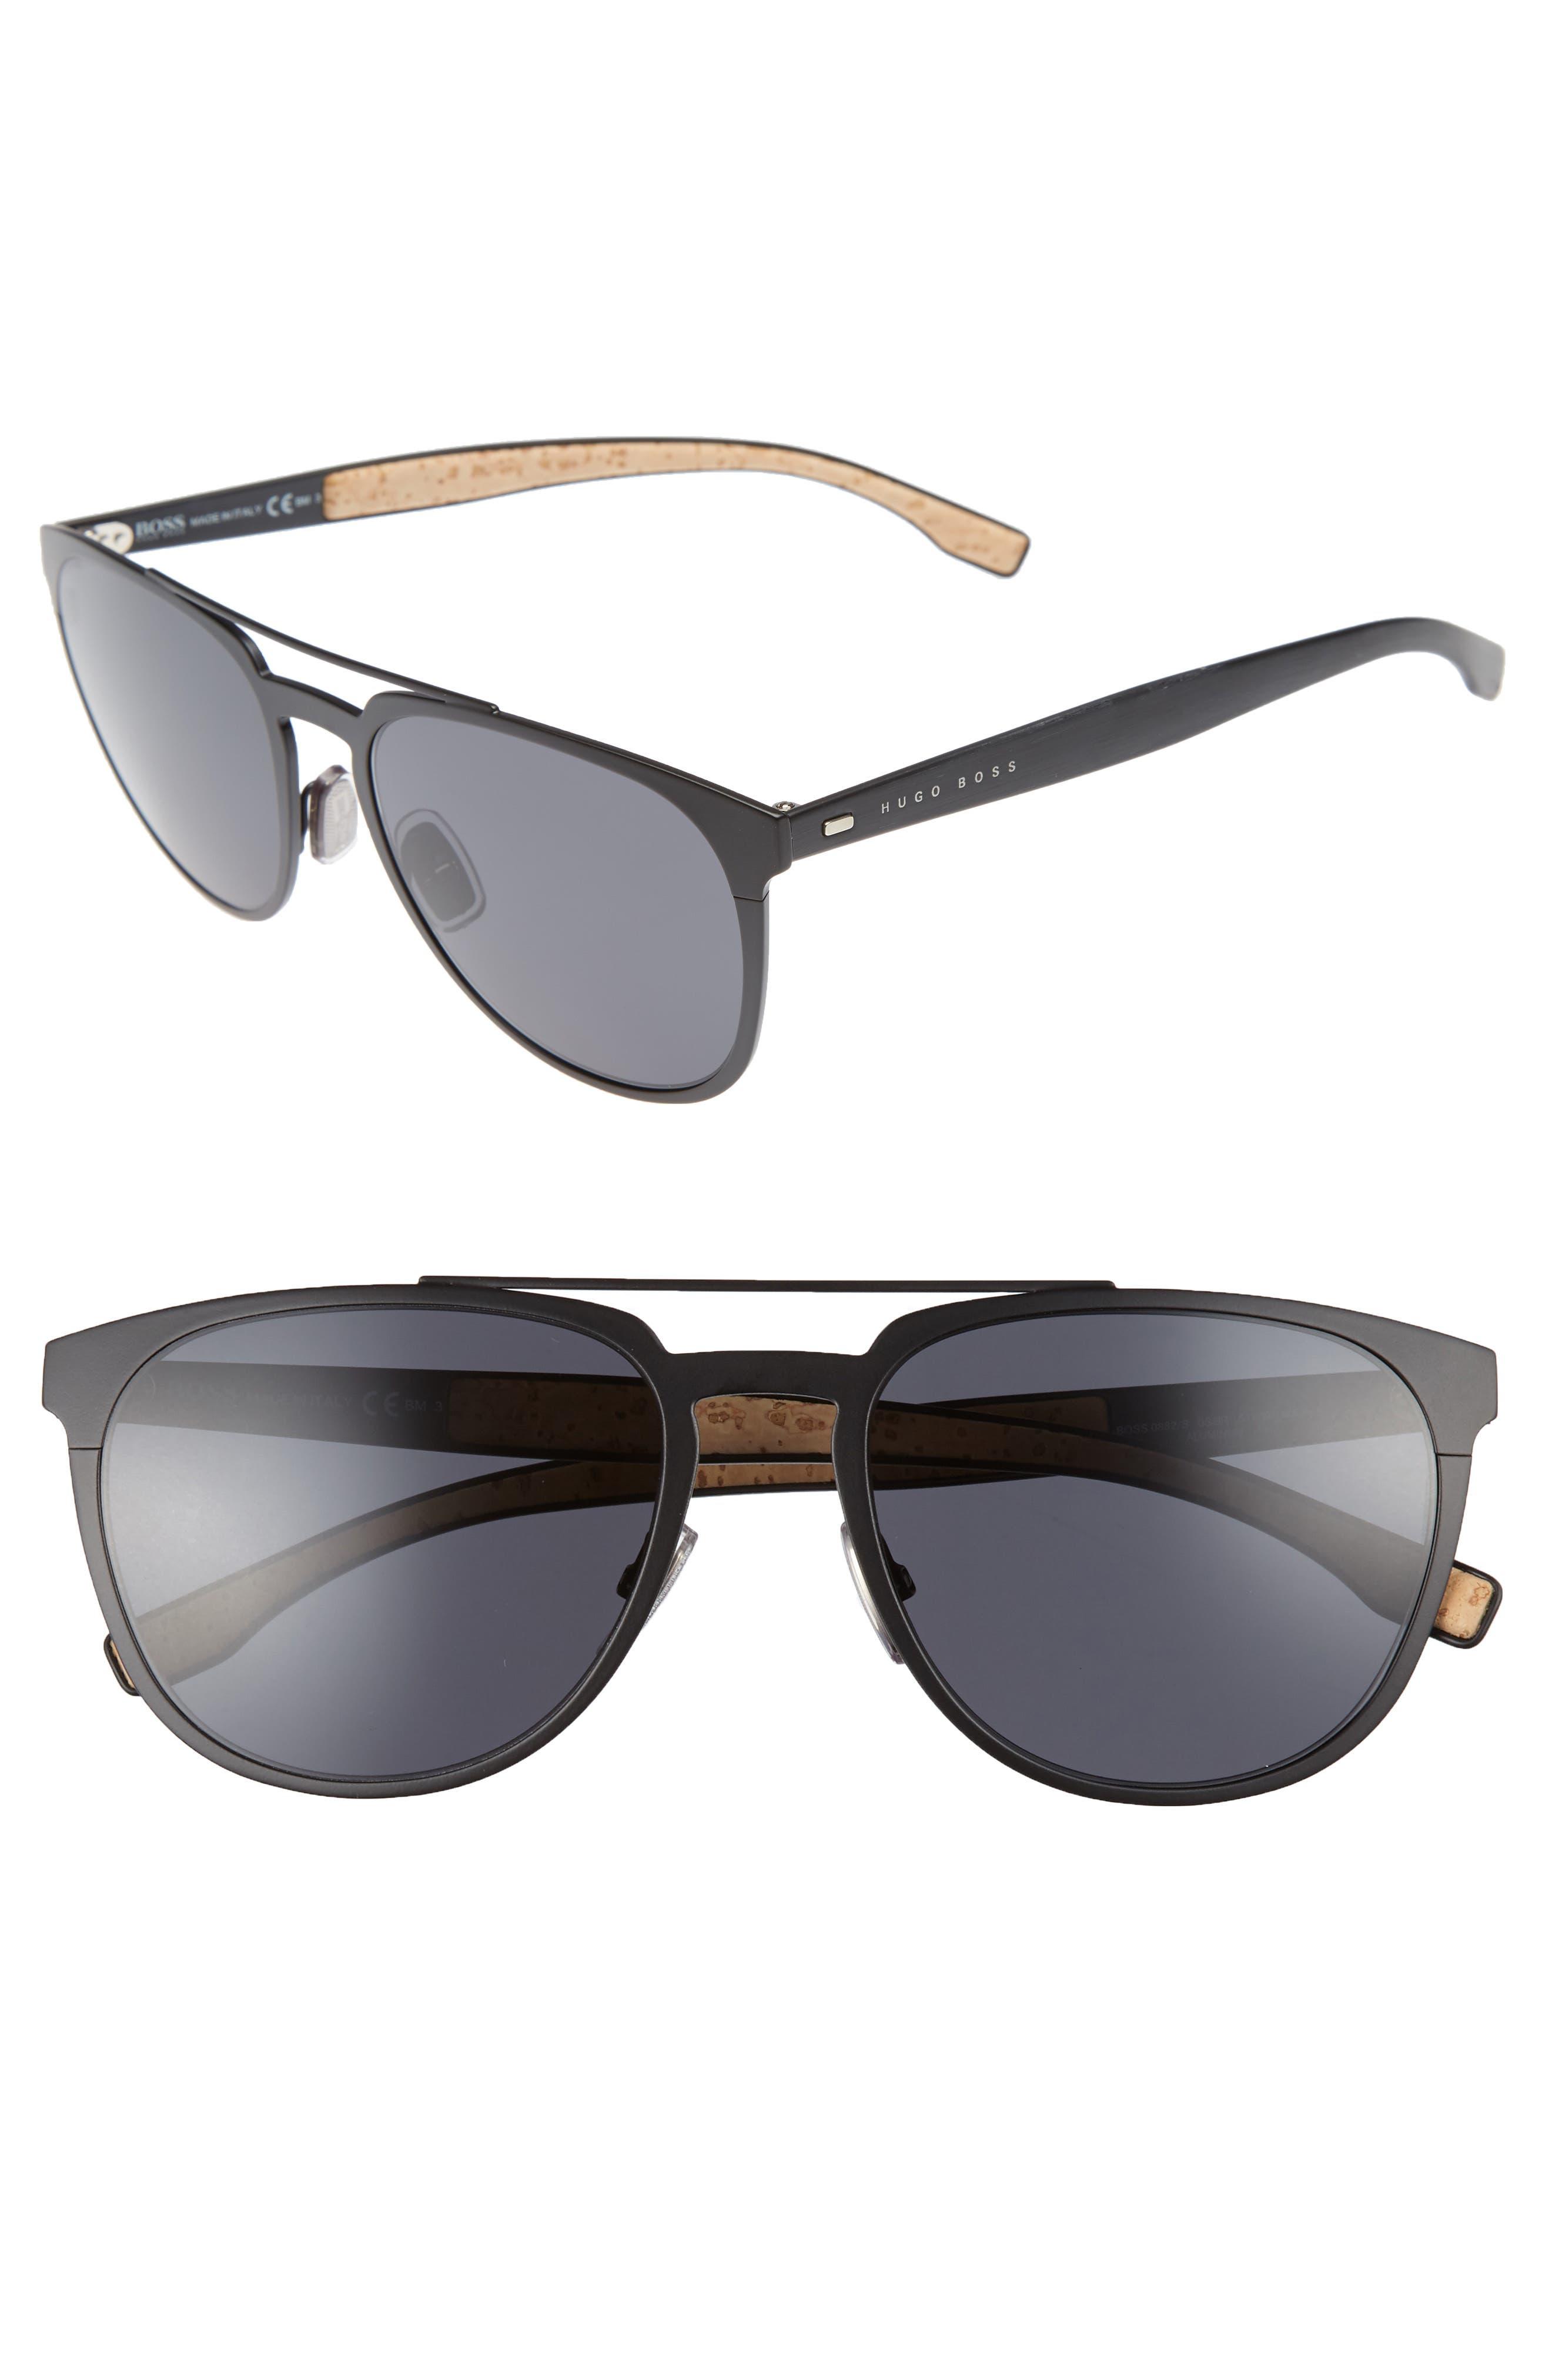 57mm Navigator Sunglasses,                         Main,                         color, Matte Black/ Grey Blue